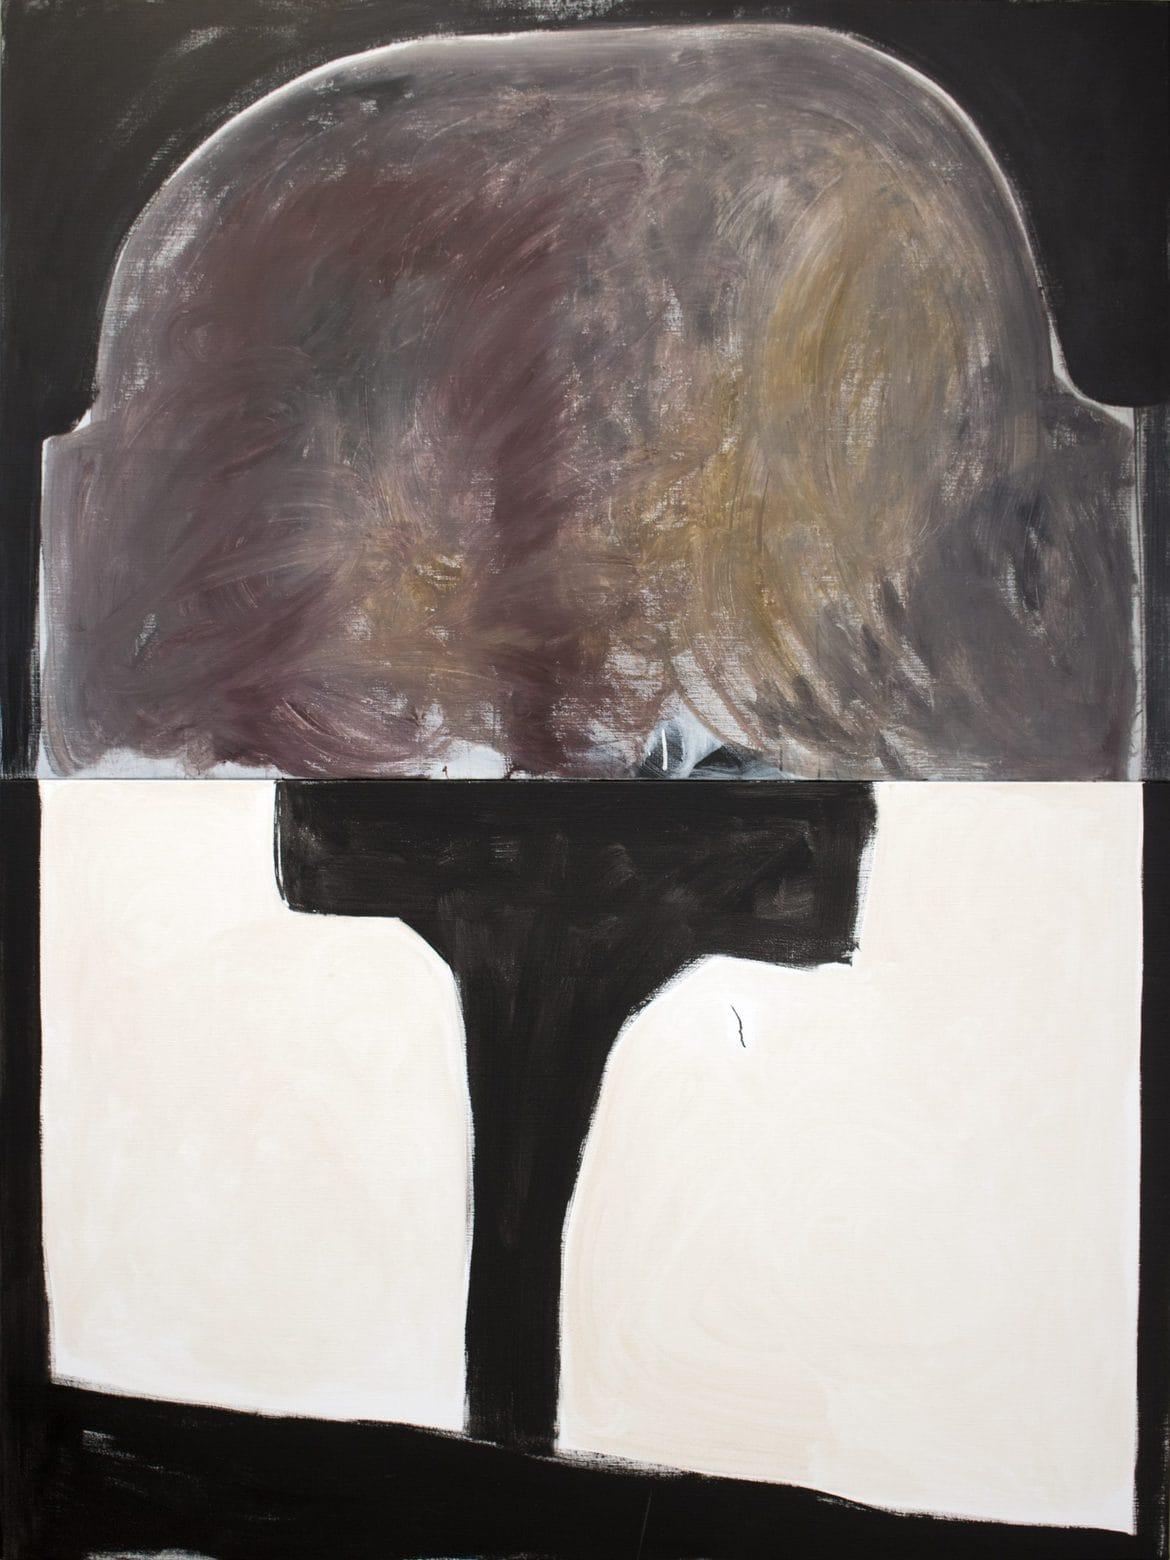 Lottie Consalvo, 'The Entrance To 'The End', 2020, acrylic on linen, 244x183cm